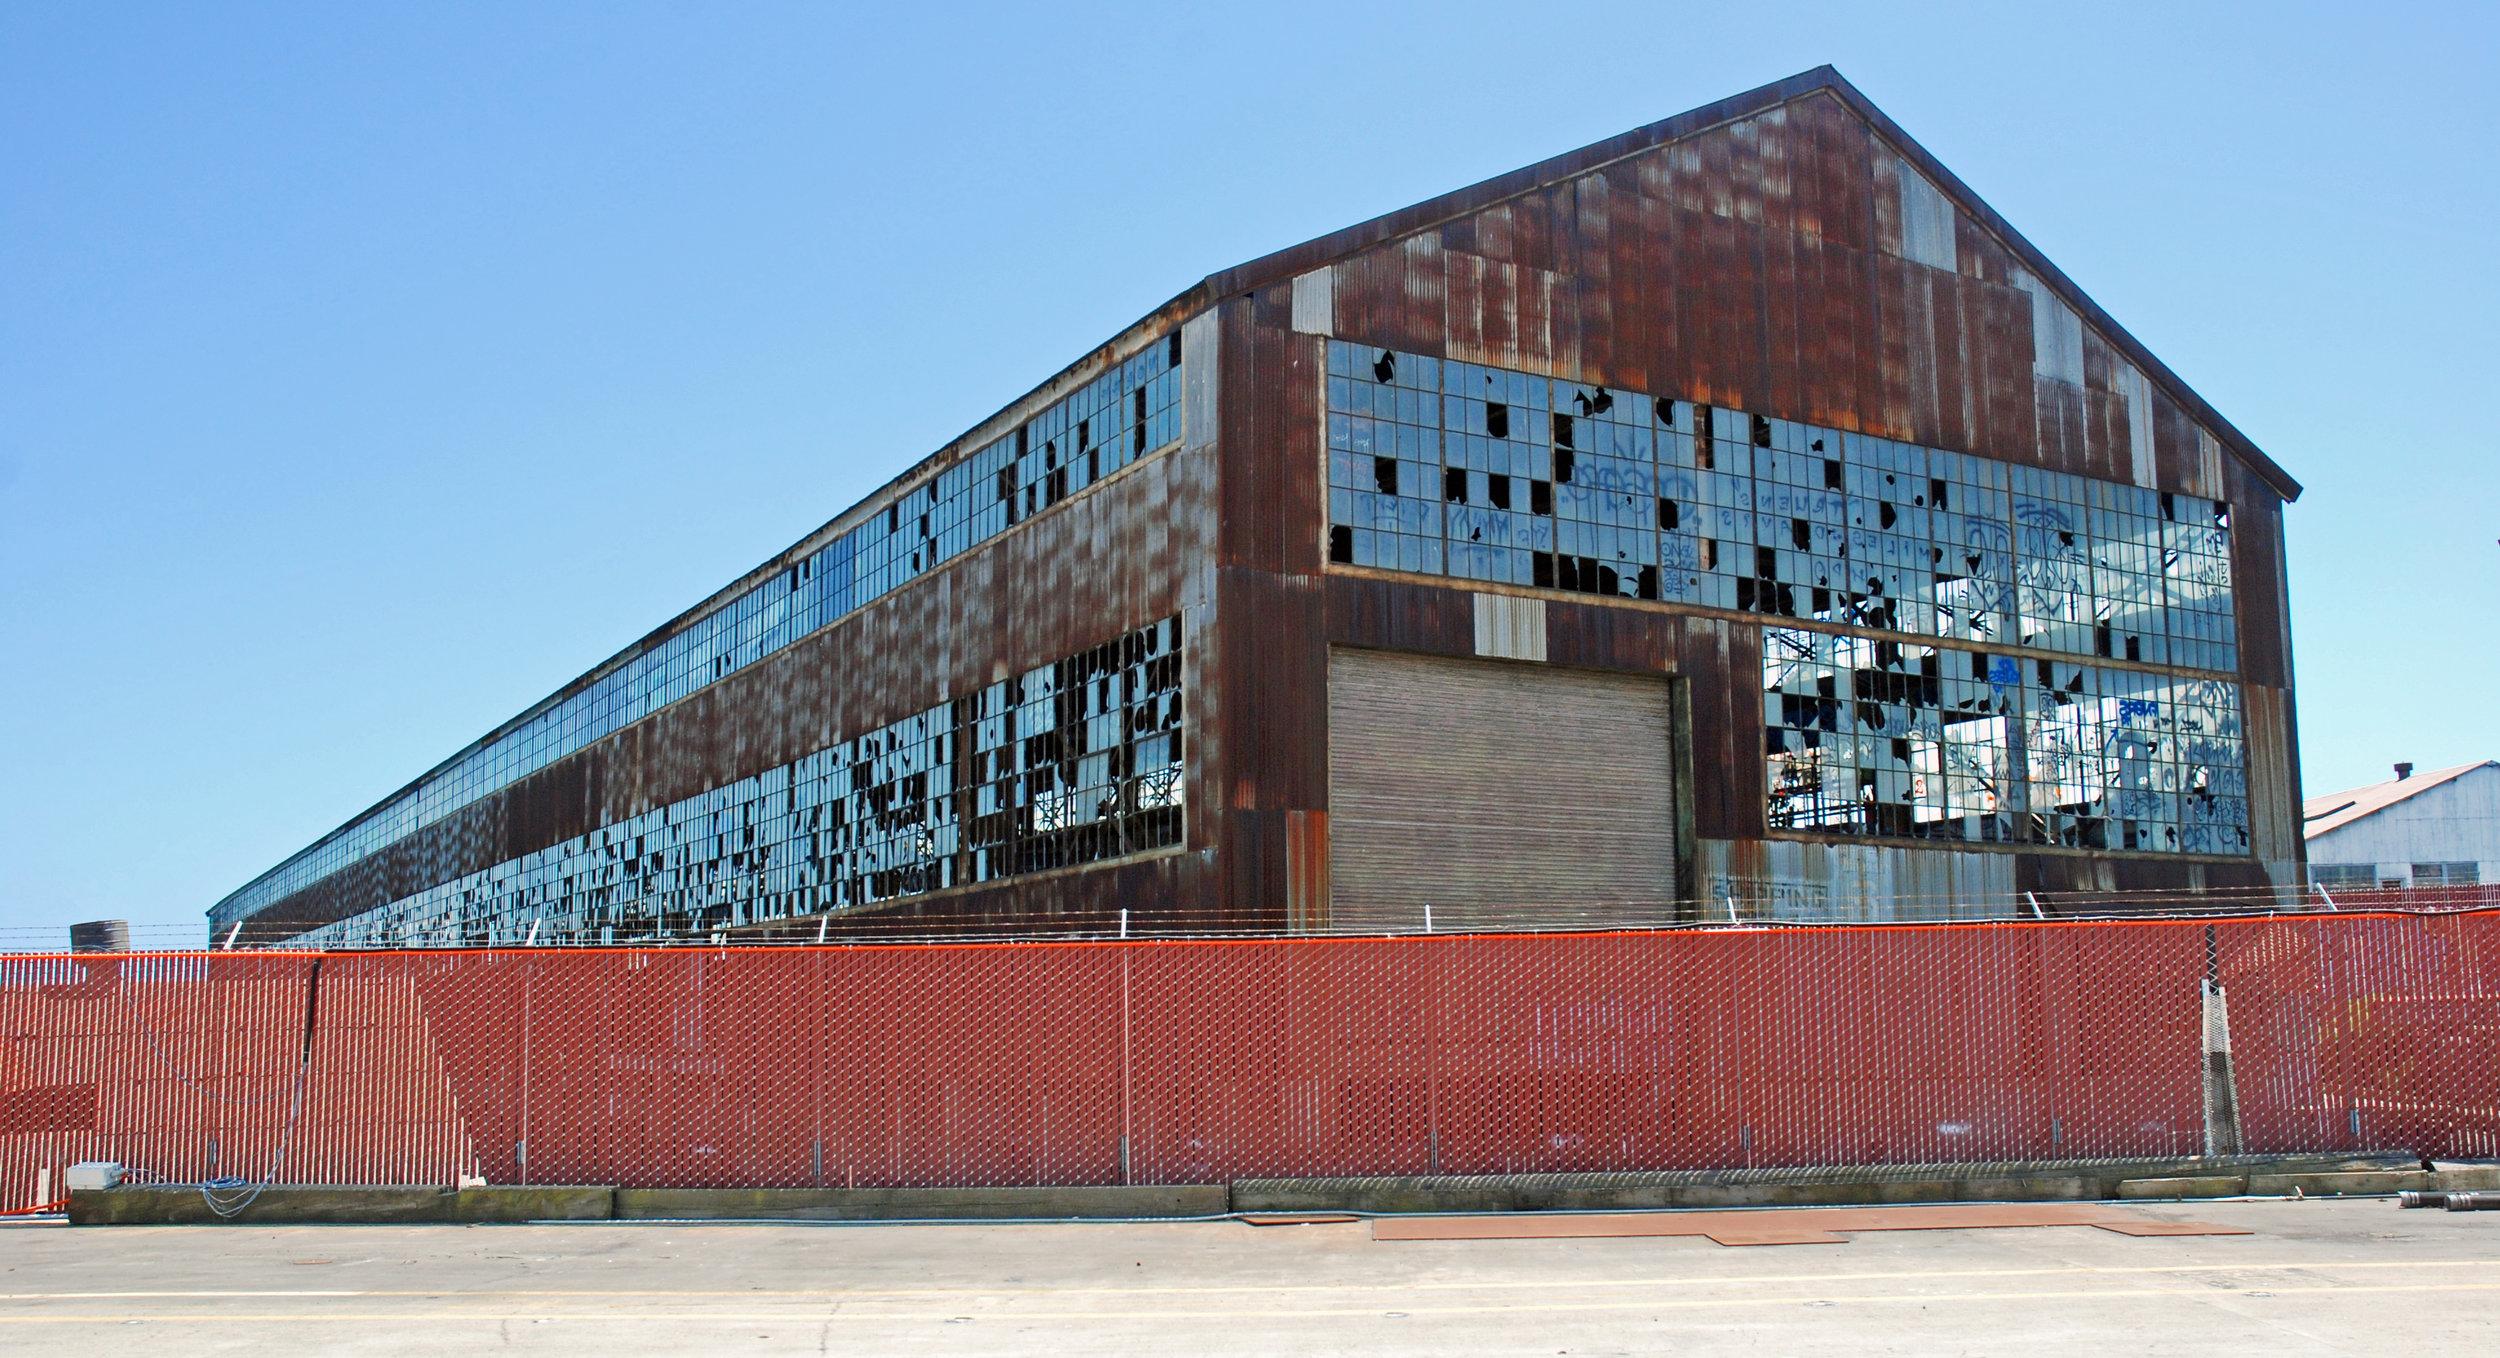 18 - warehouse 1 now.jpg